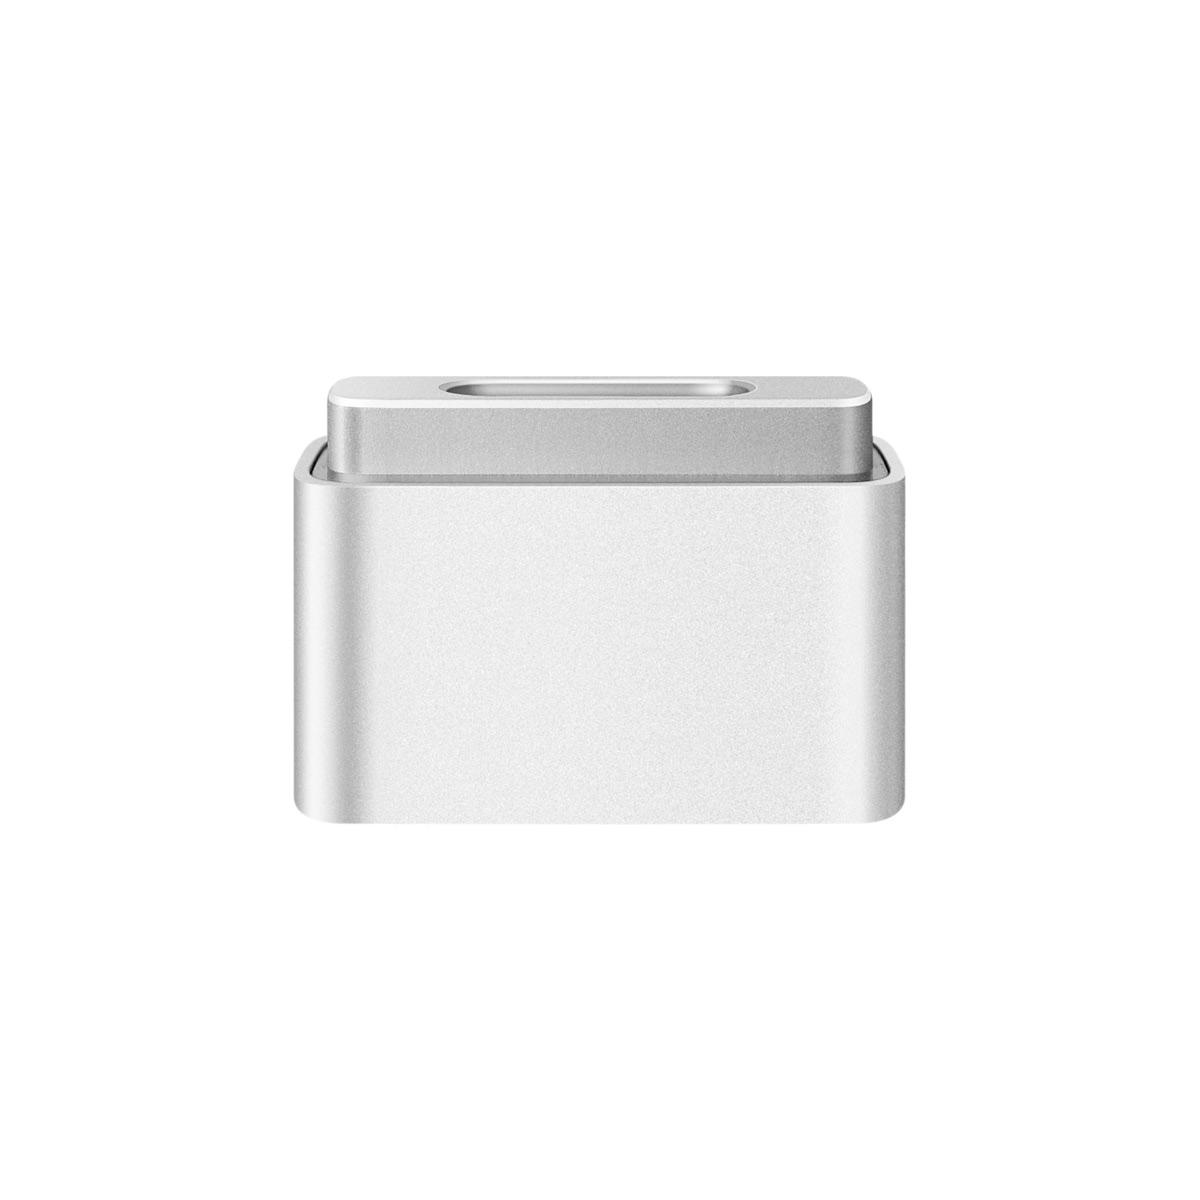 Apple MagSafe to MagSafe 2 Converter MAGSAFE2-CONVERTER